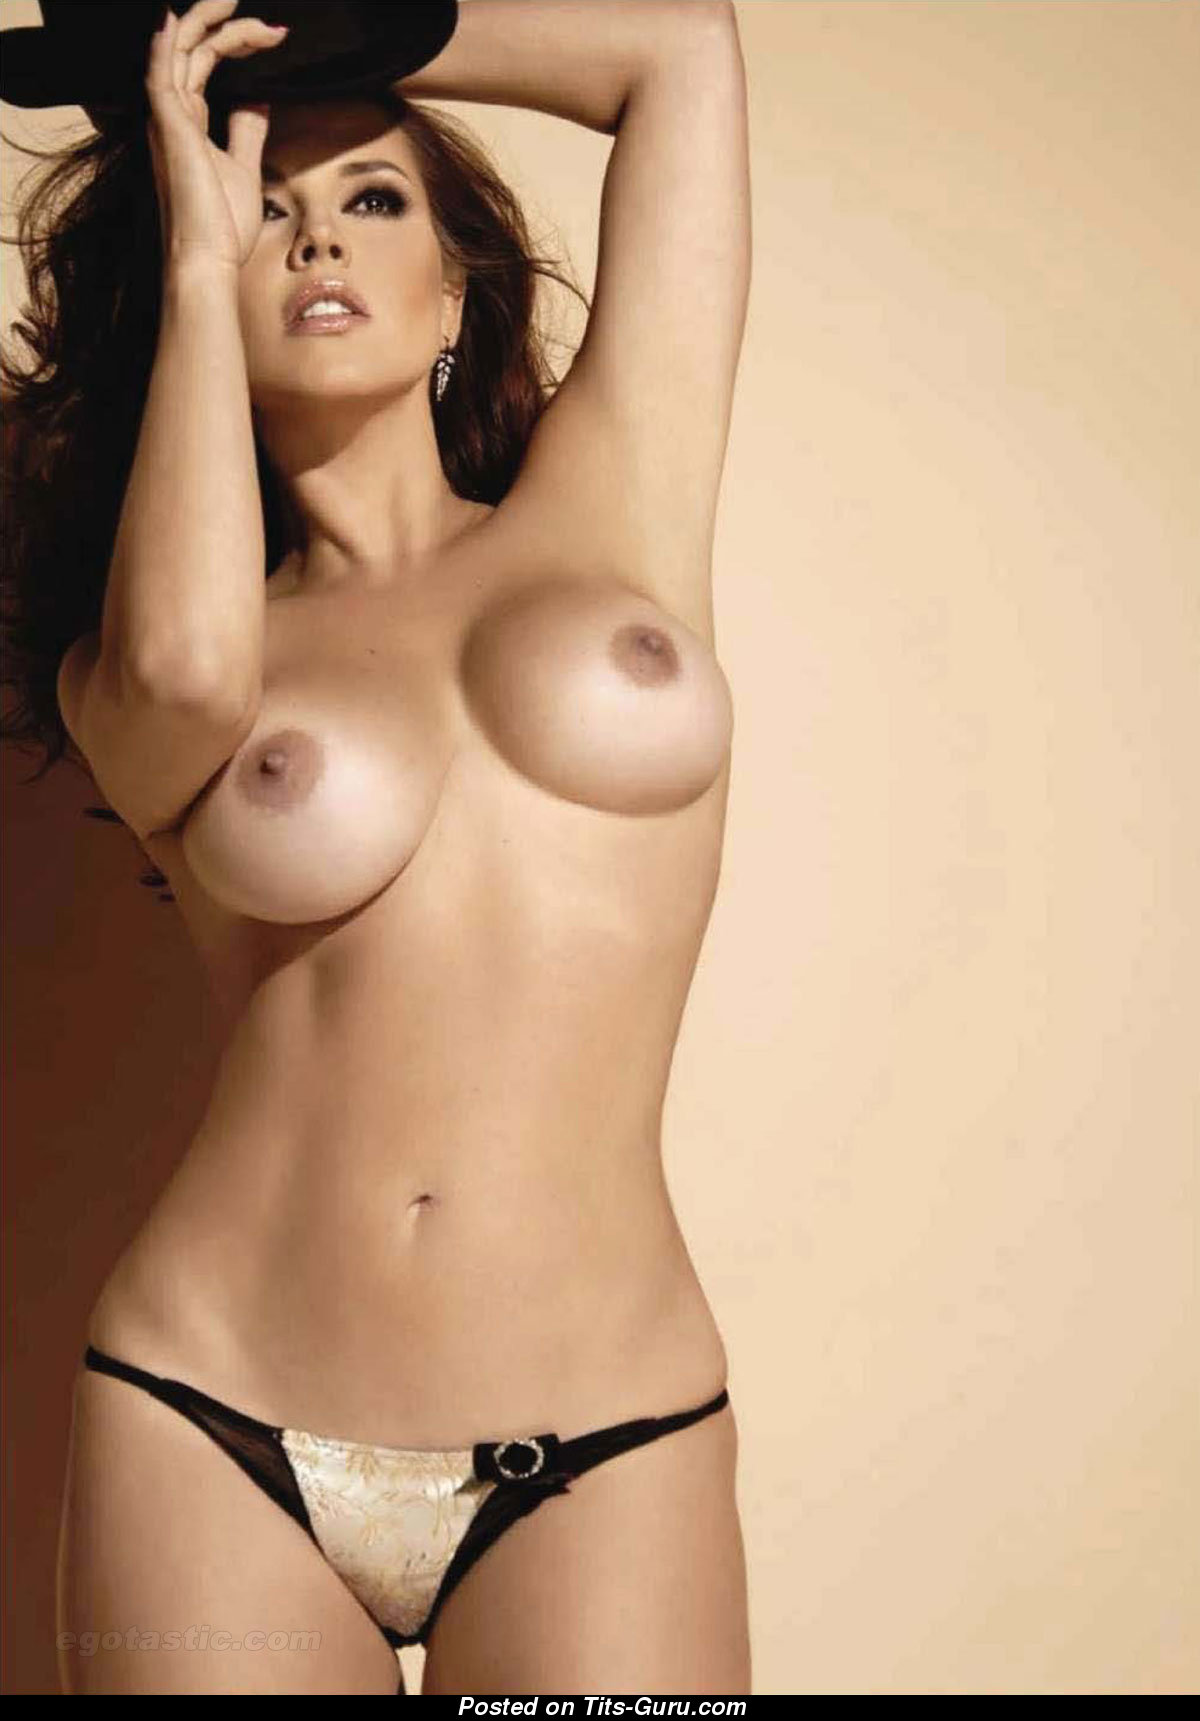 Alicia free machado nude pic